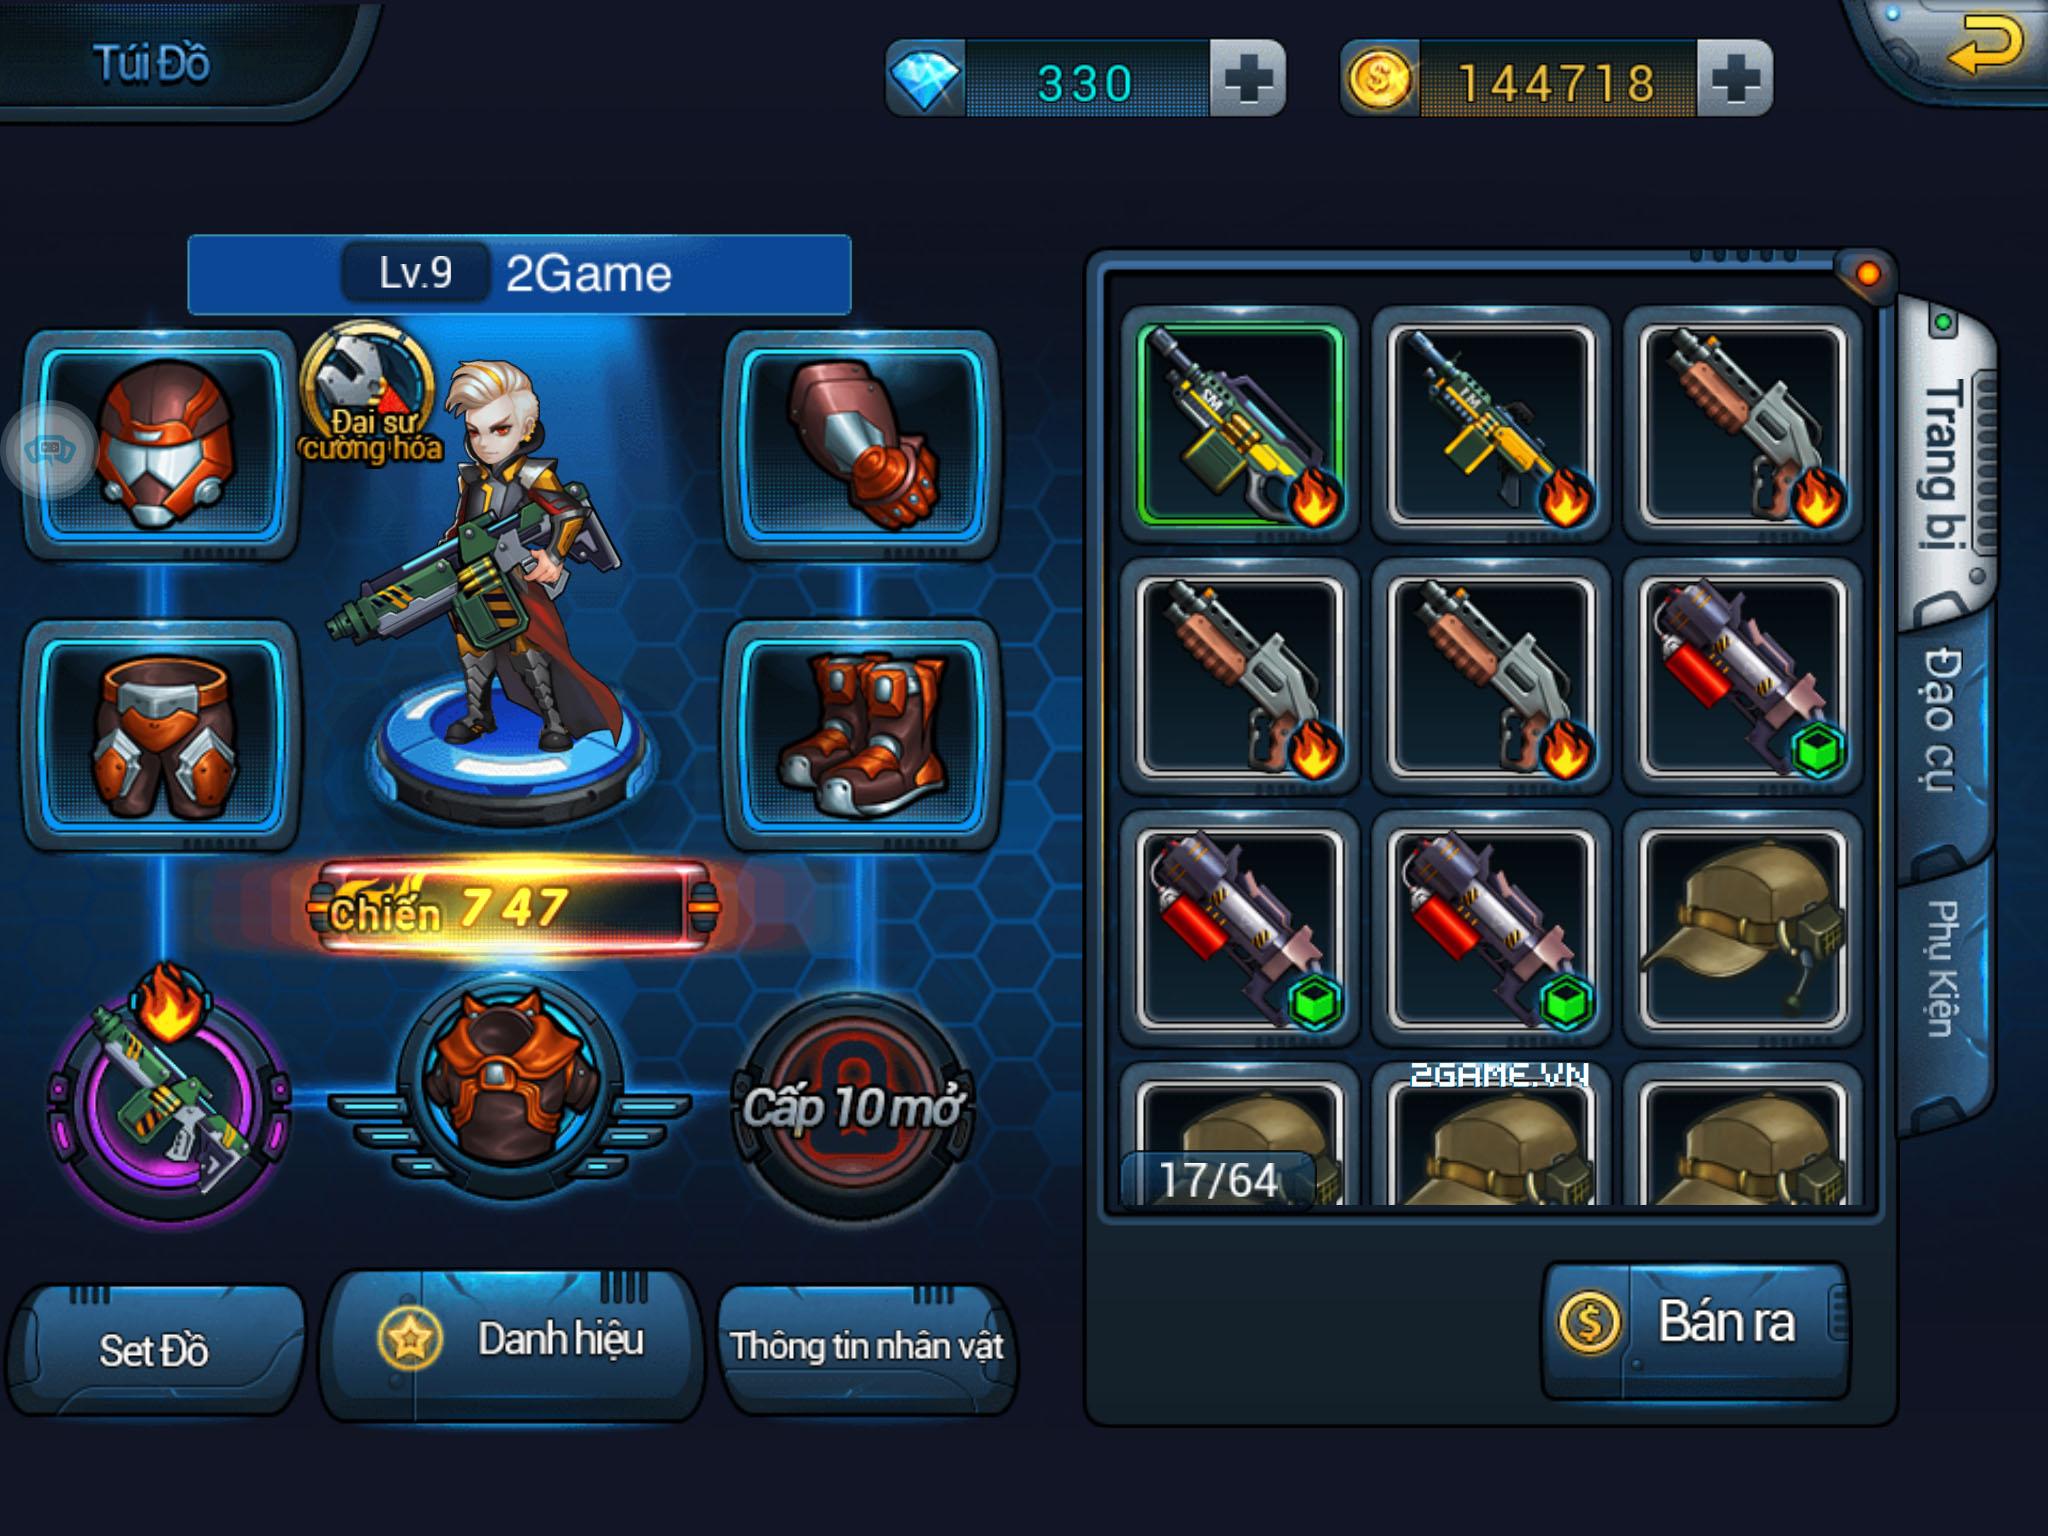 2game_trai_nghiem_avengers_huyen_thoai_vh_6.jpg (2048×1536)